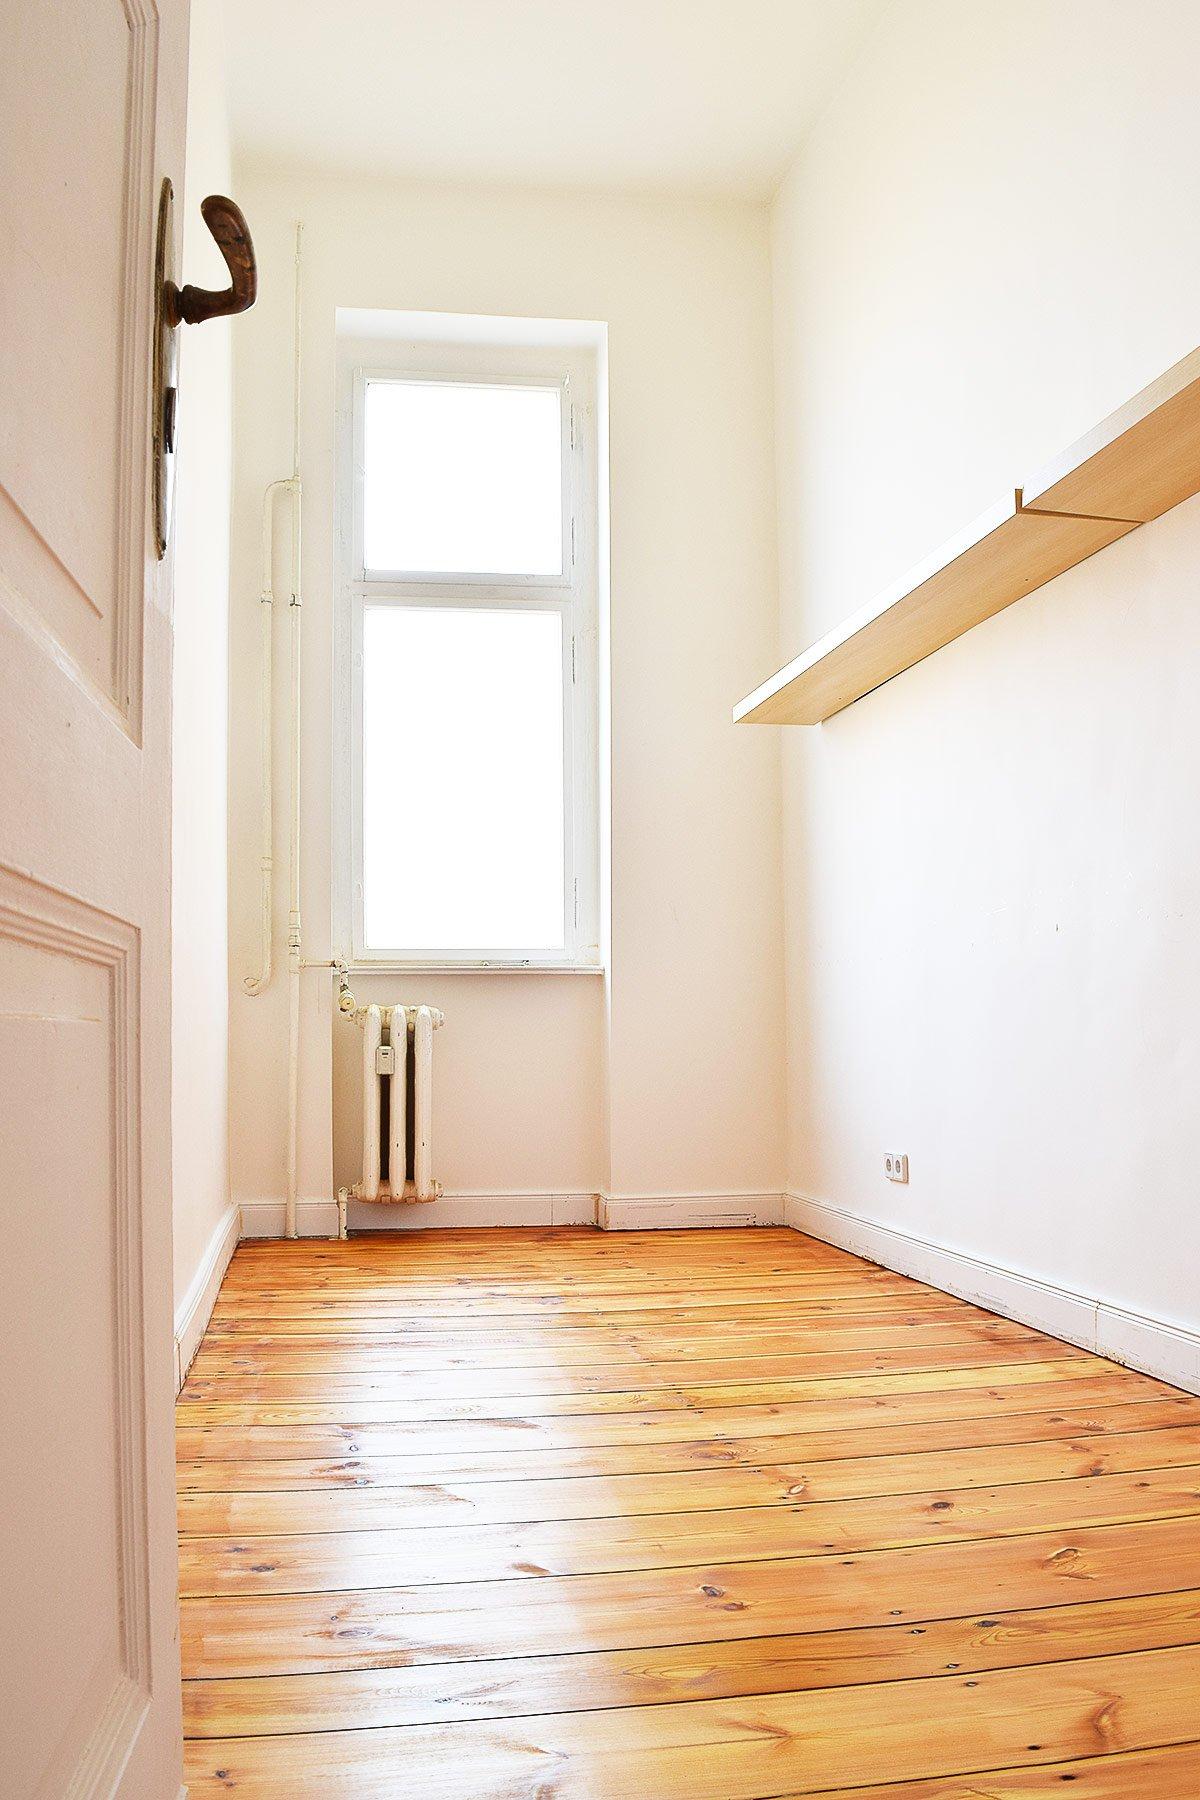 Dessing Room - Before | Little House On The Corner